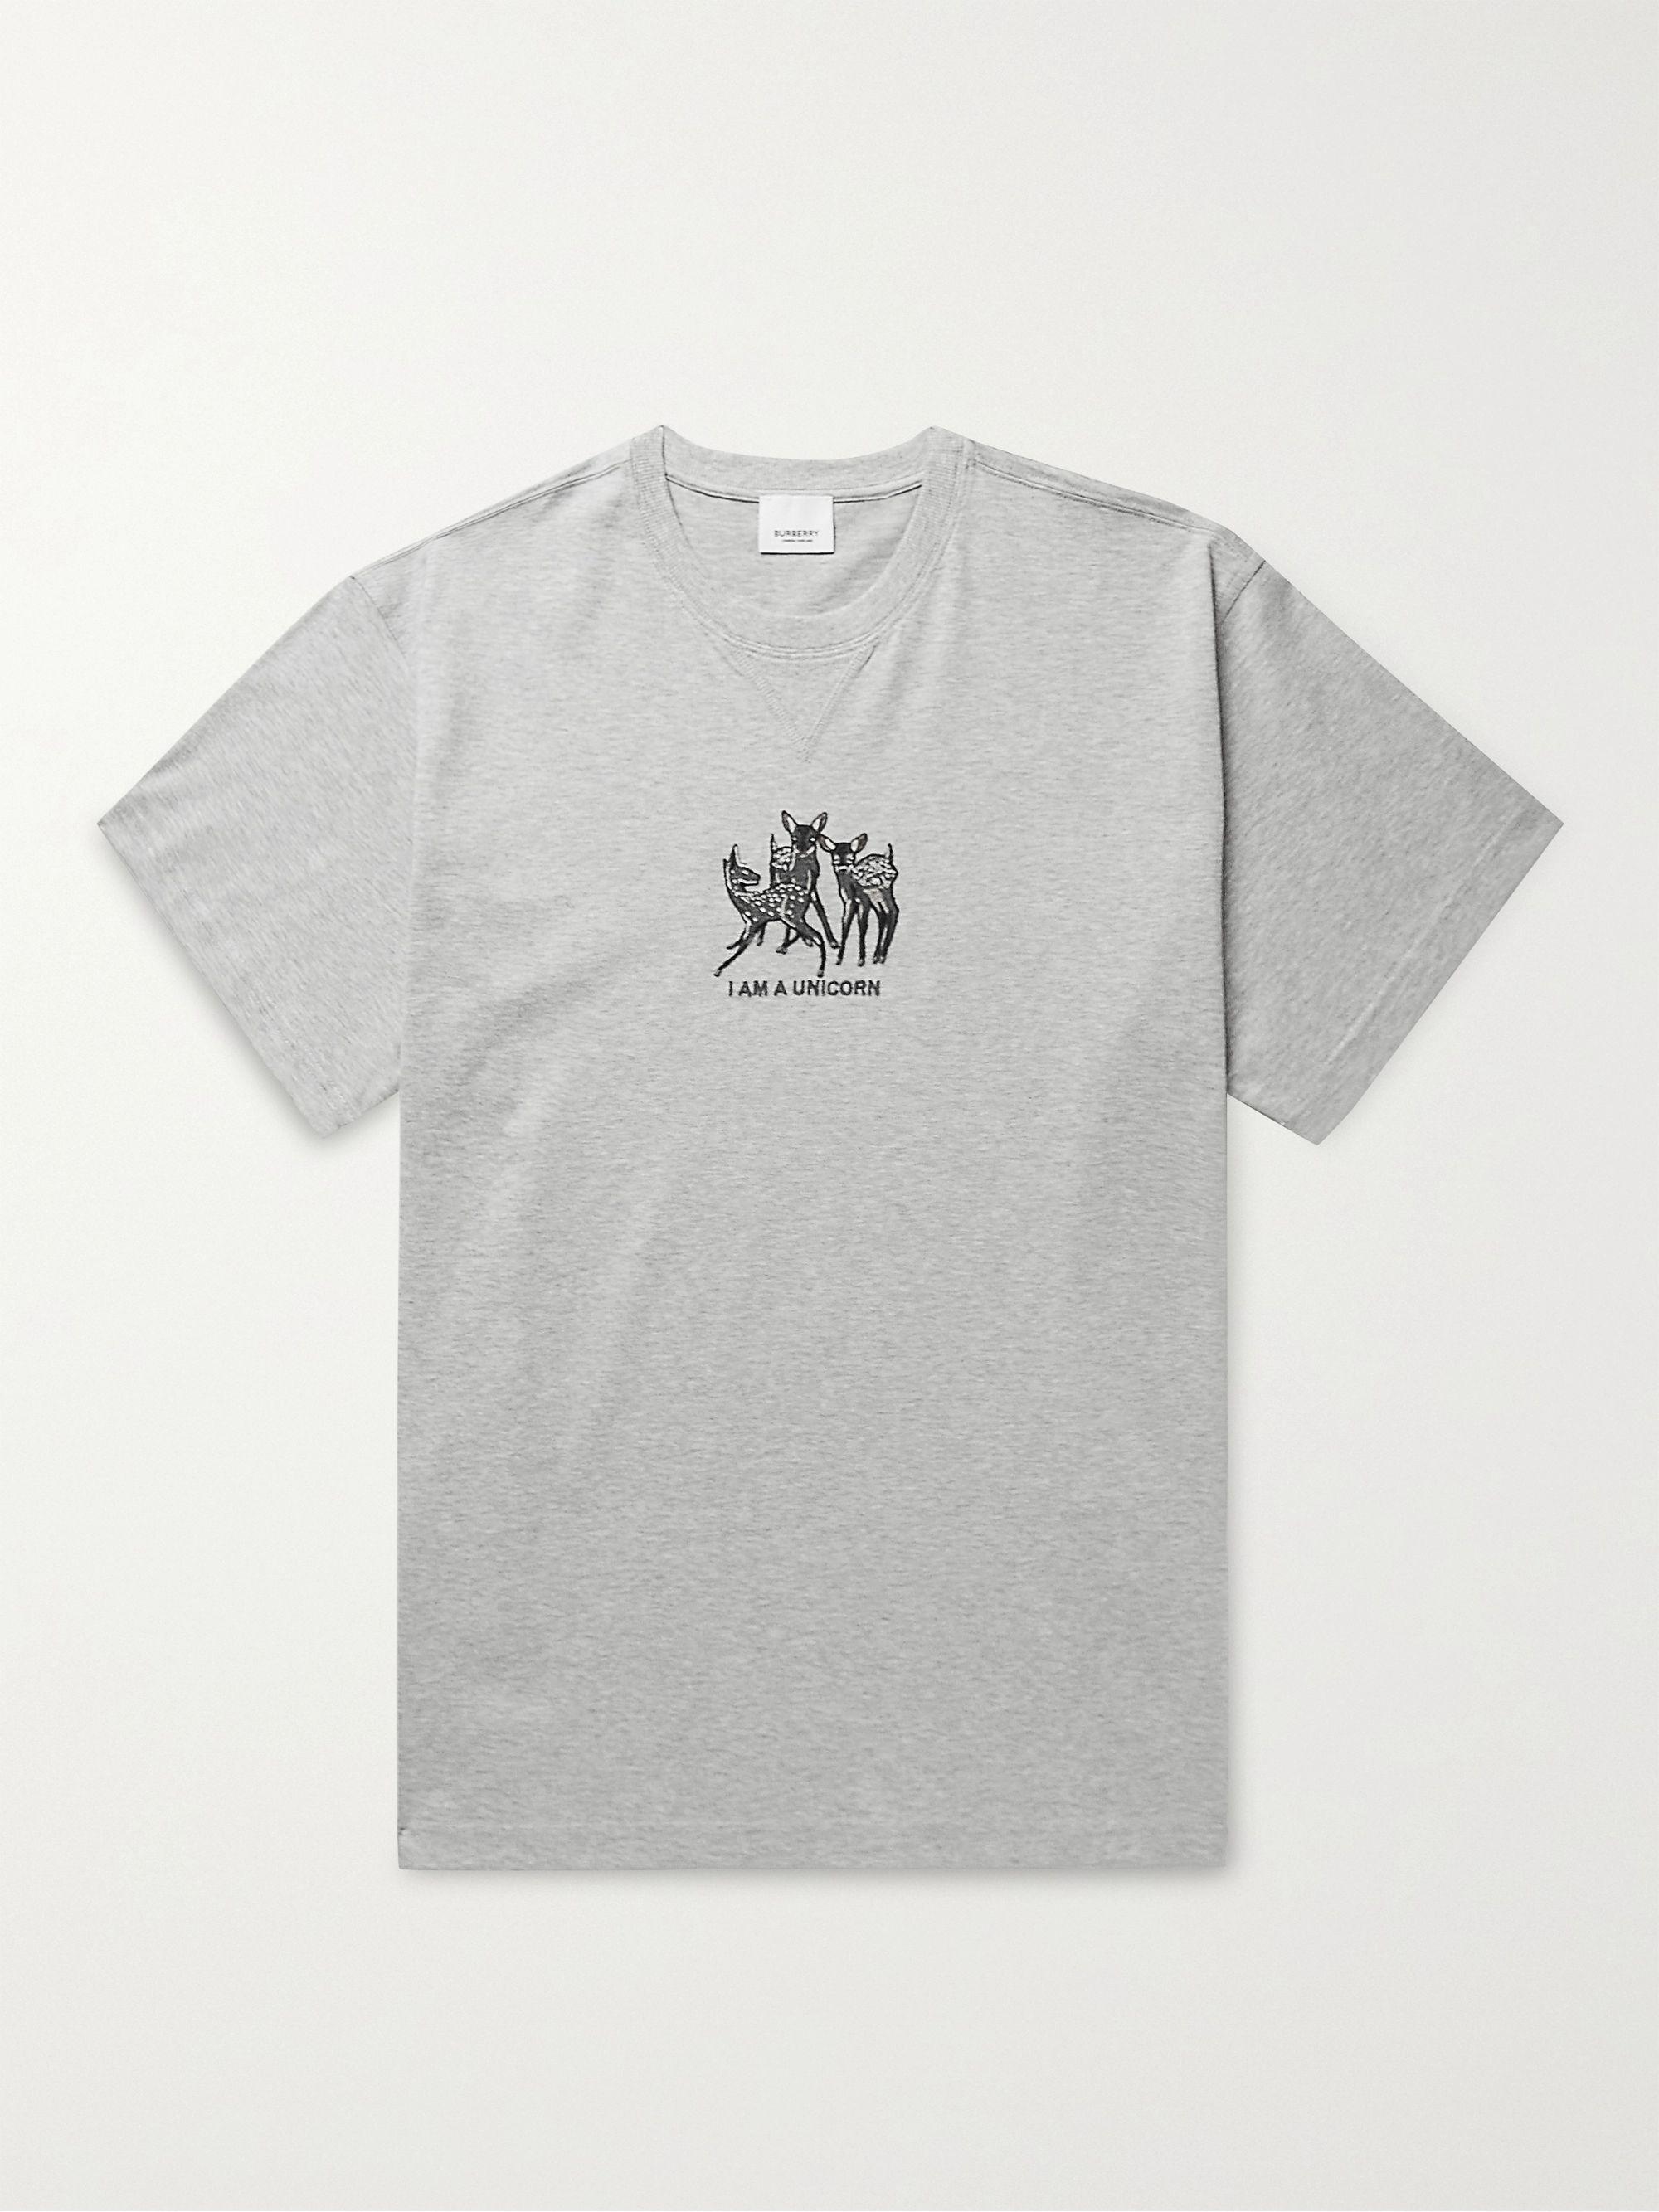 BURBERRY Appliqued Cotton-Jersey T-Shirt